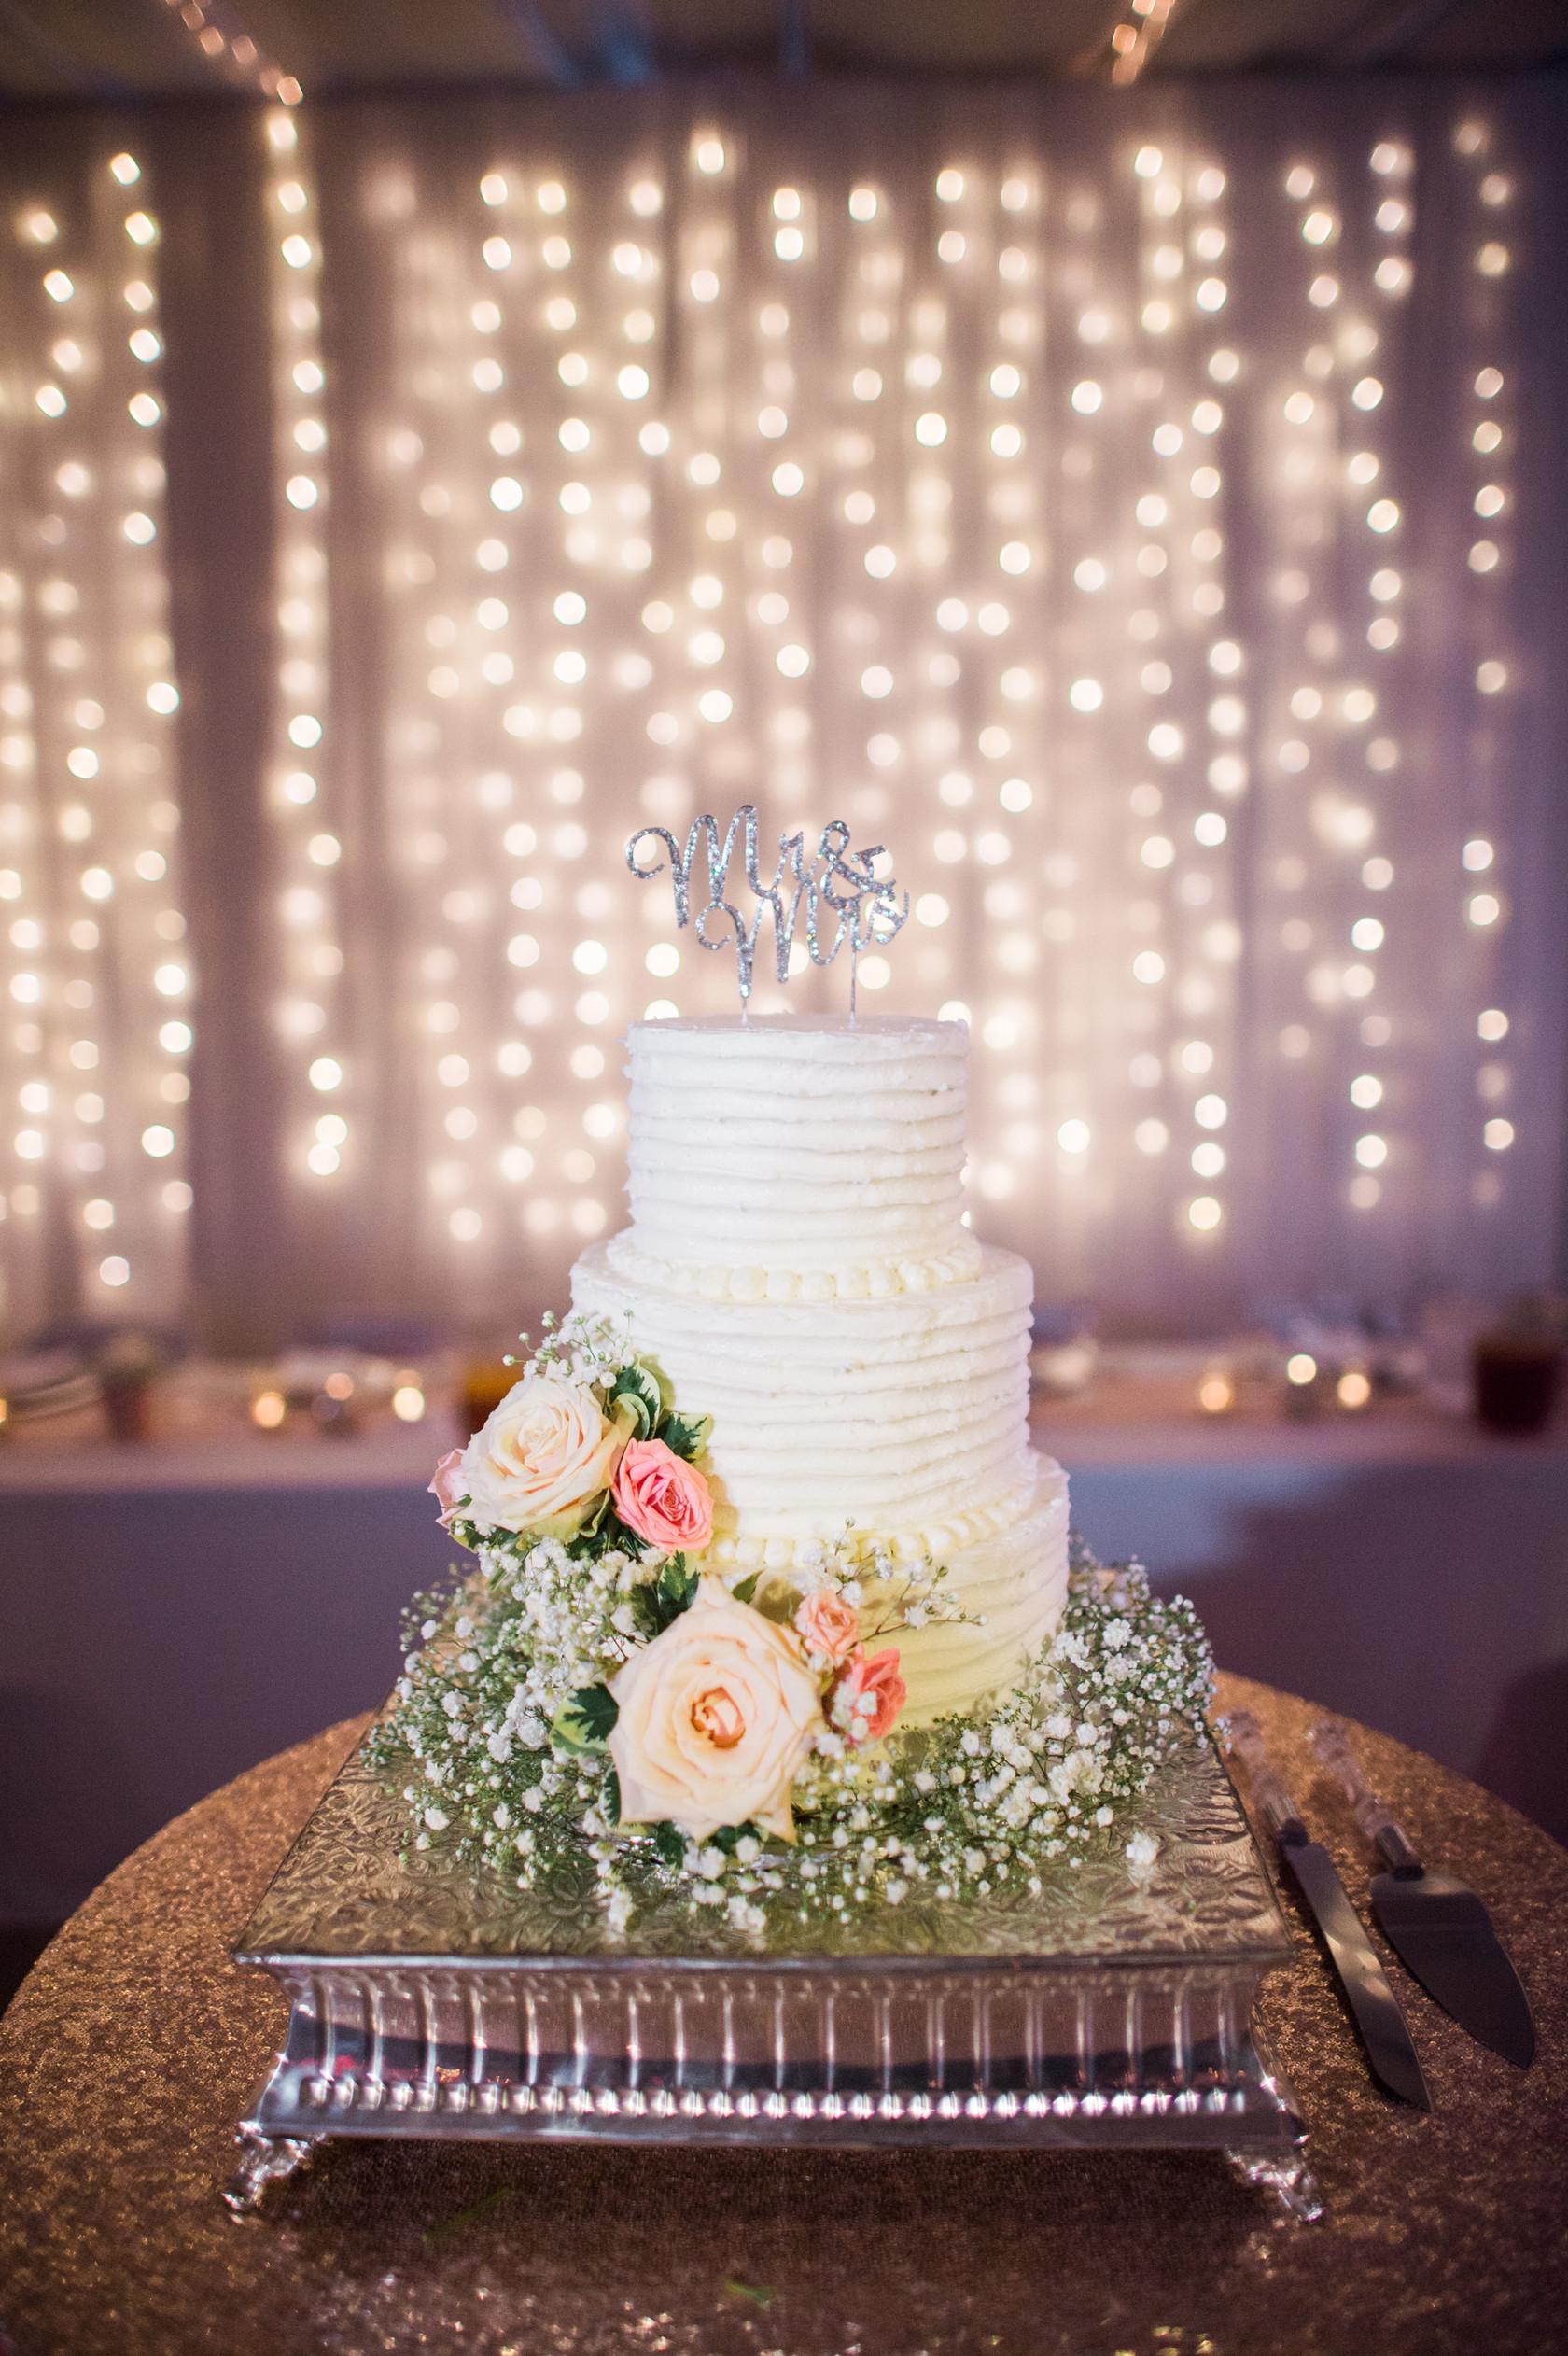 Wedding Cakes Manhattan Ks  Beautiful Isolations graphy LLC Manhattan KS